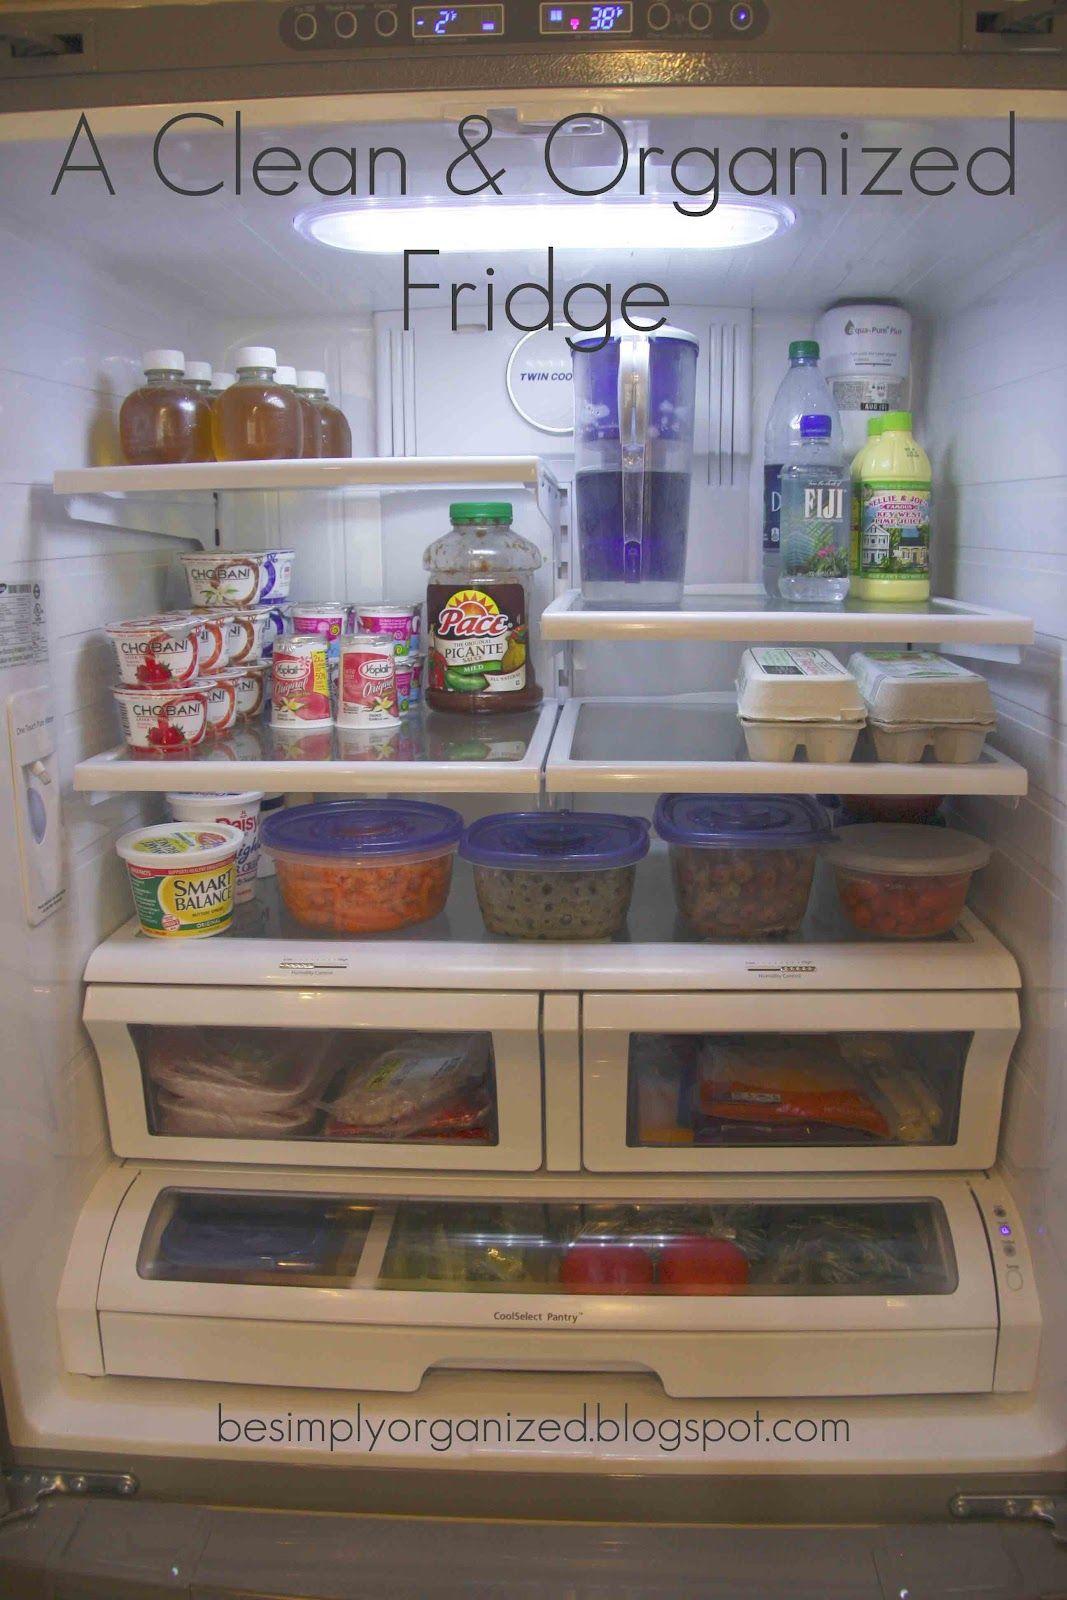 simply organized: a clean & organized fridge